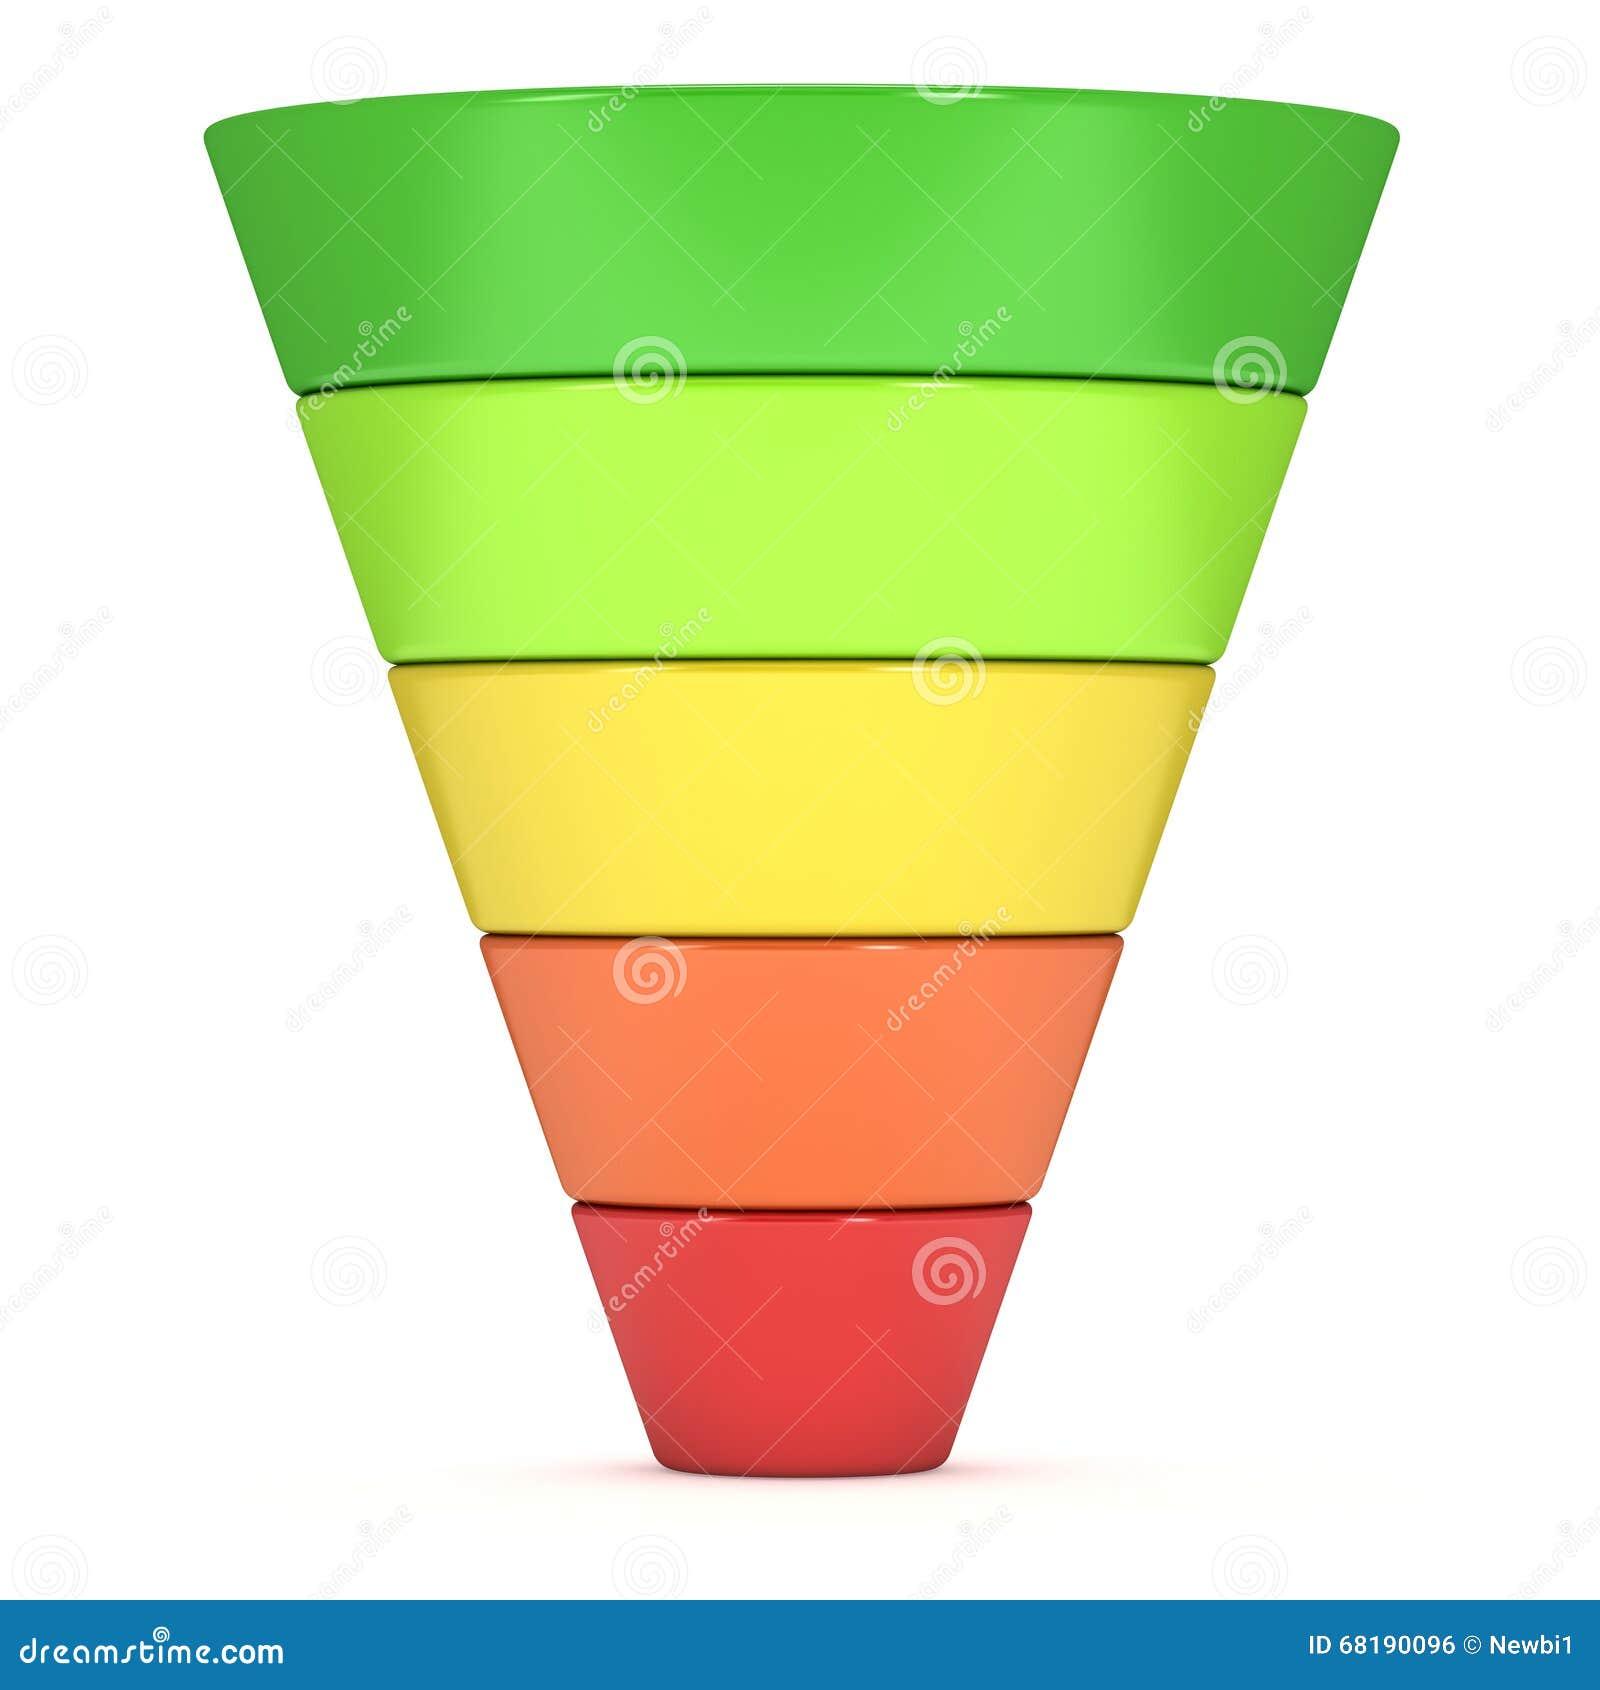 Marketing Sales: Marketing Funnel Sales Stock Illustration